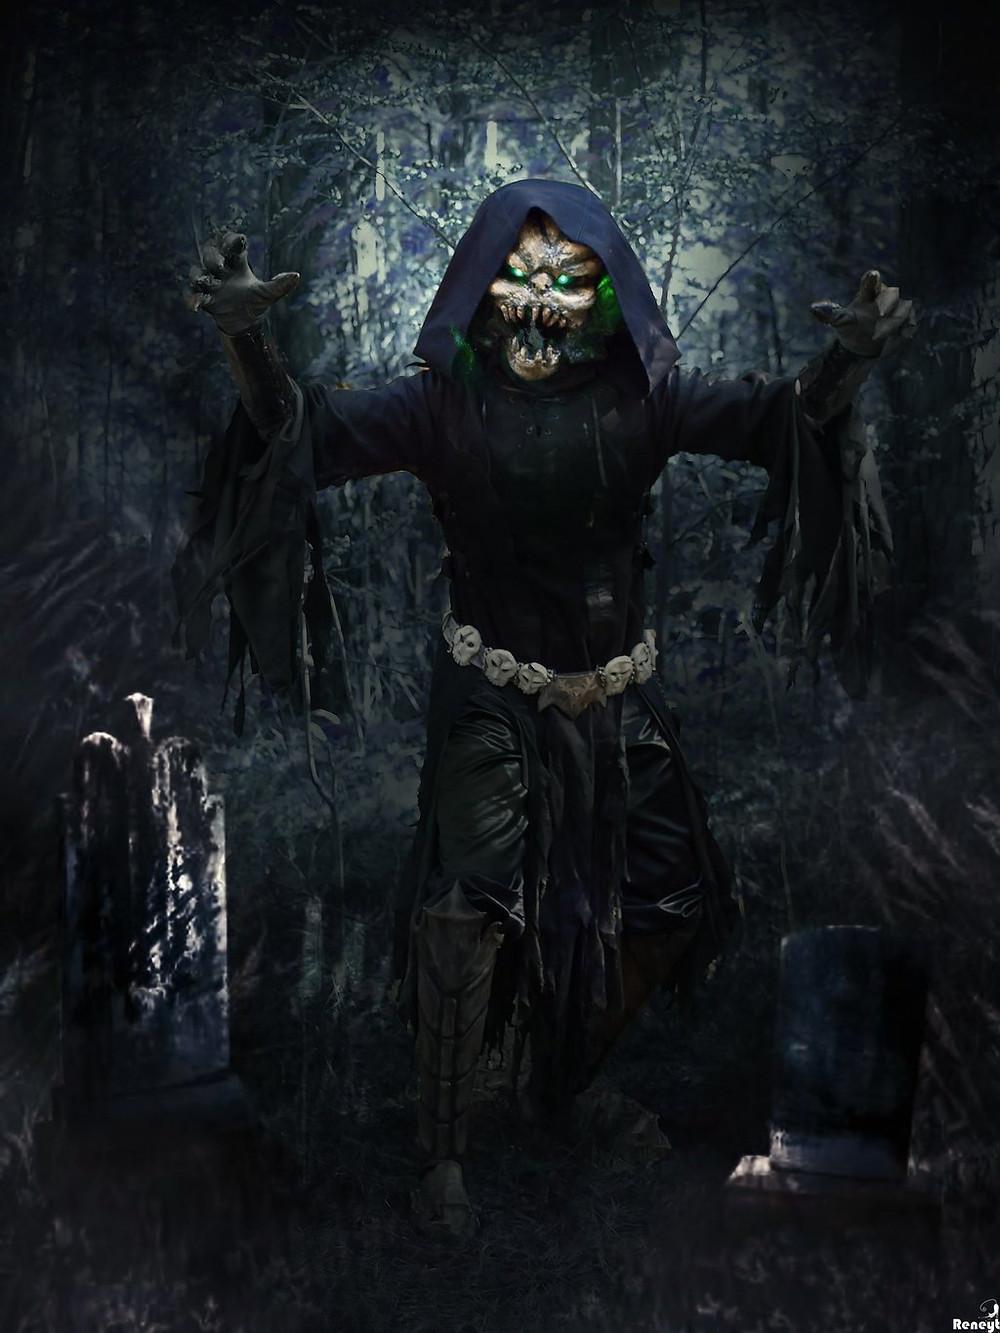 cosplay___thresh__the_chain_warden__by_svetliy_sudar-d80ky55